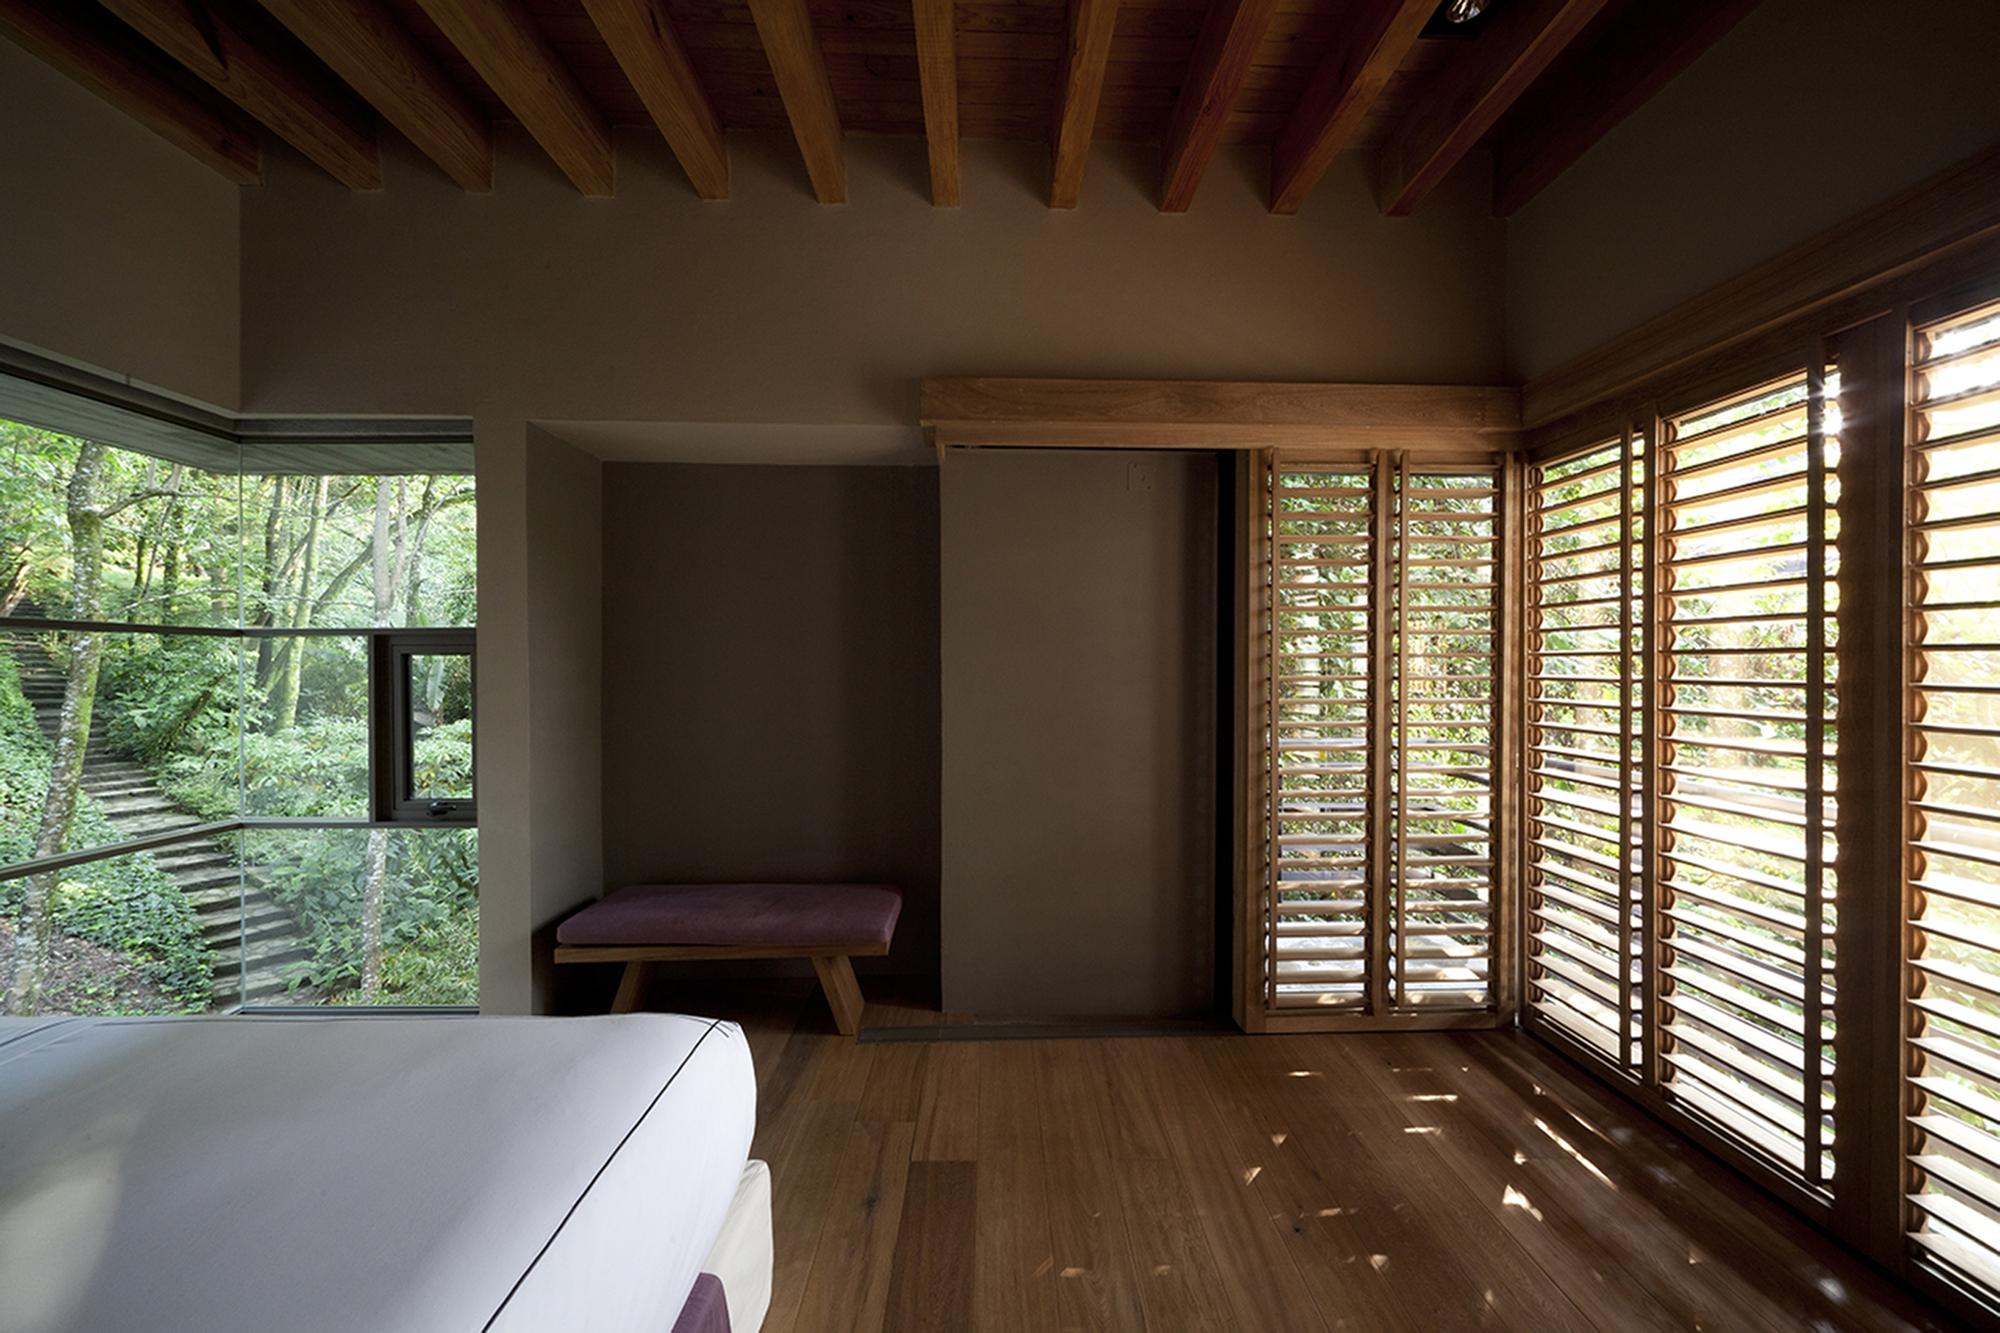 530eb7b5c07a802c76000127_house-maza-chk-arquitectura_2014_02_18_mz_fotos_yoshihiro_2280px_ancho_-21-